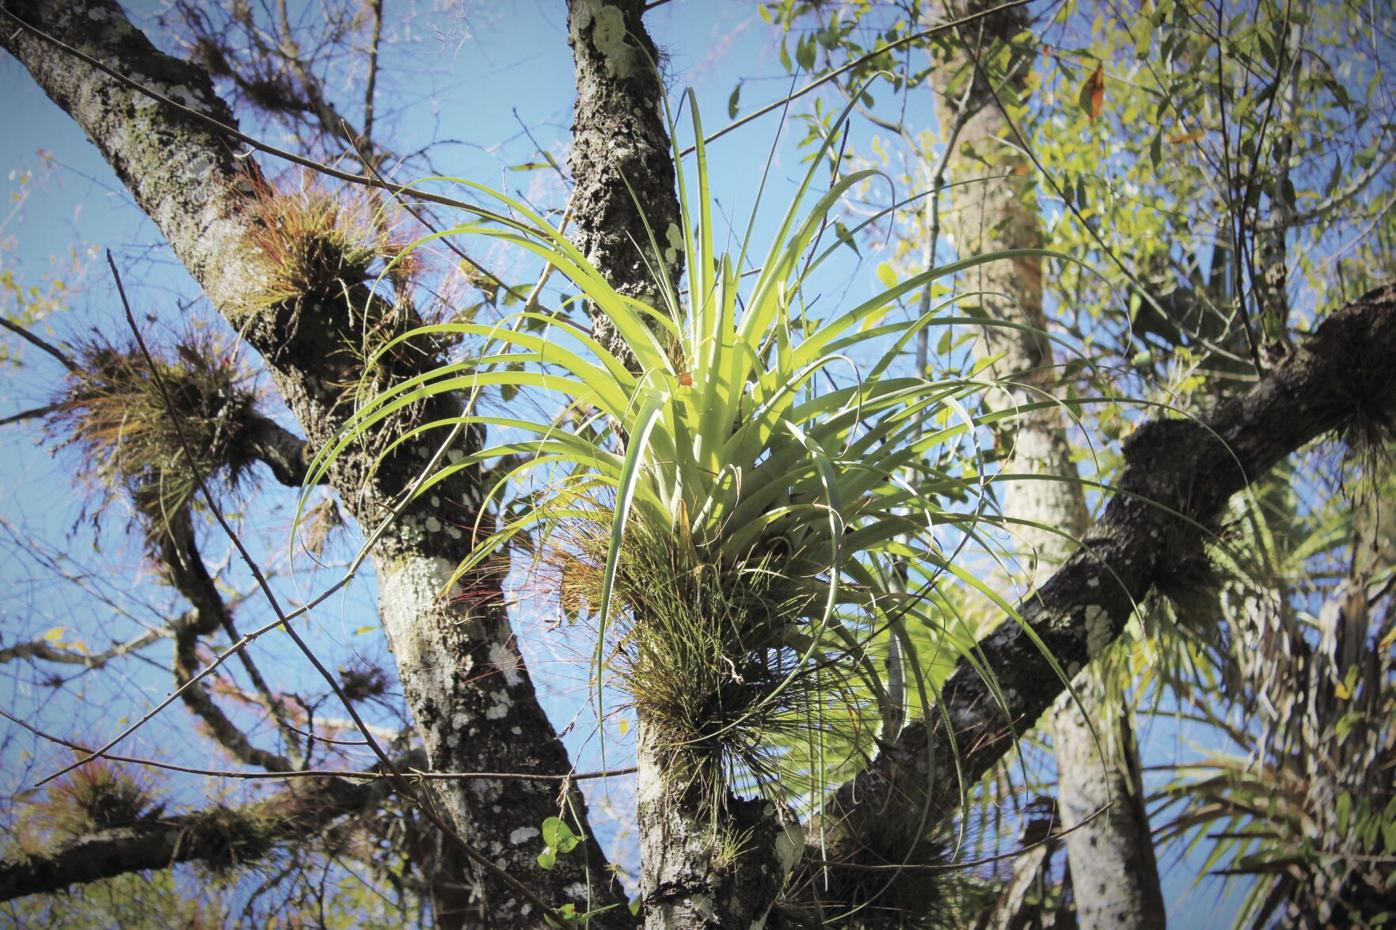 Tree airplant